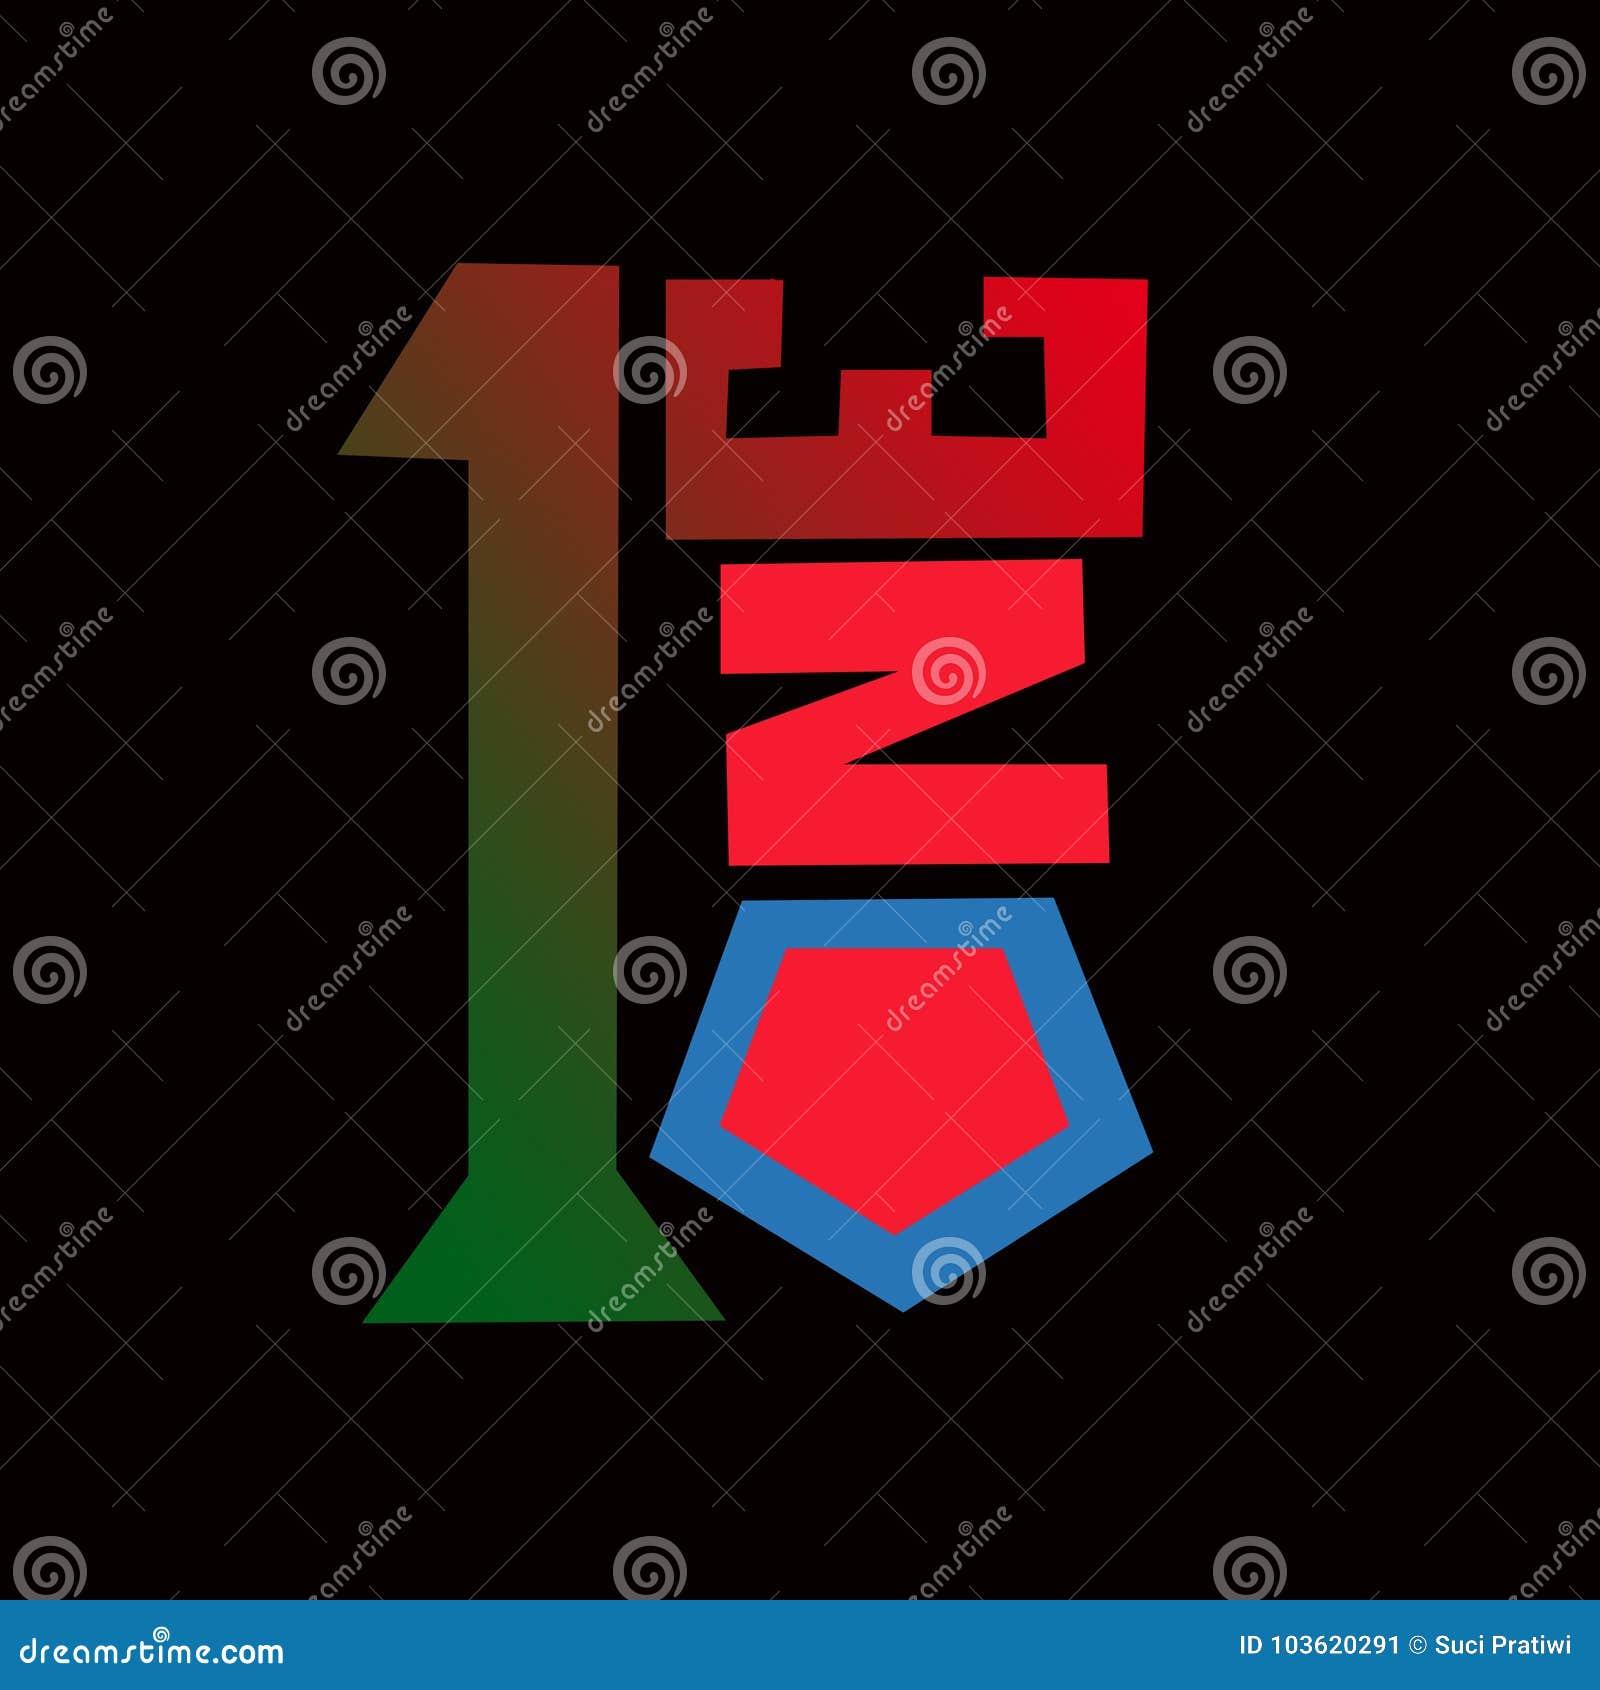 1one Symbols Illustration Stock Illustration Illustration Of